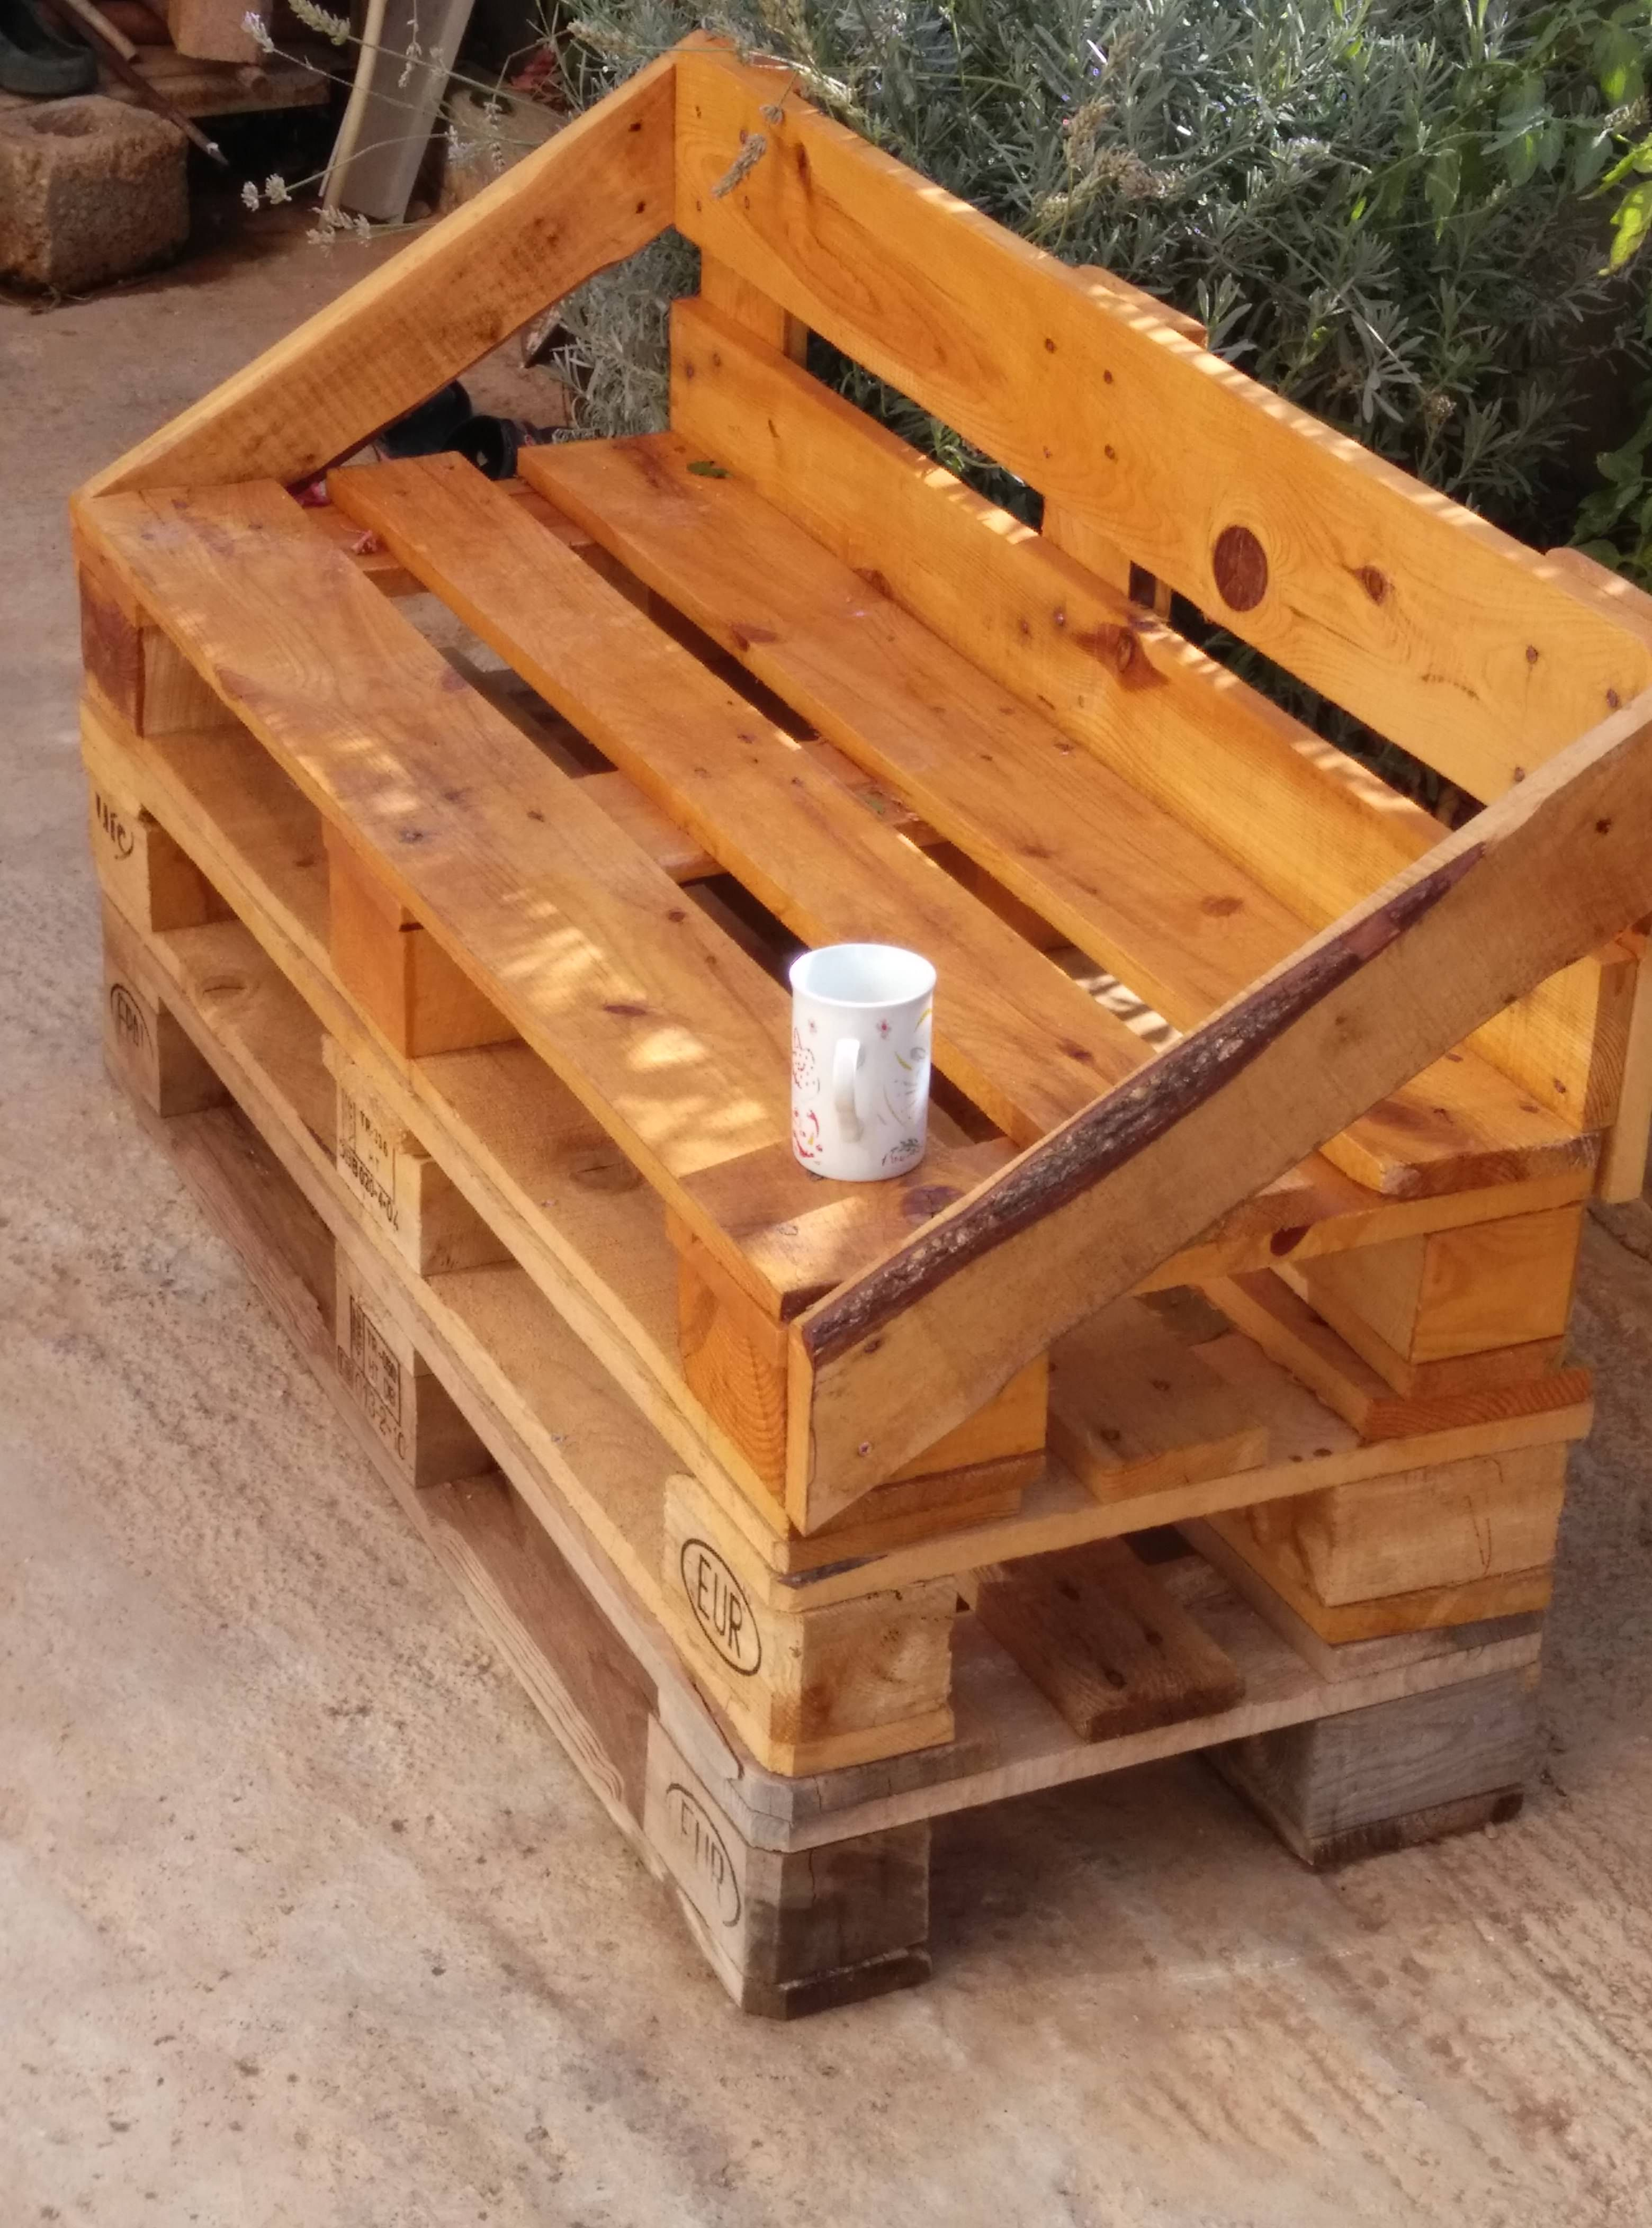 Outdoor Pallet Sofa • Pallet Ideas • 1001 Pallets